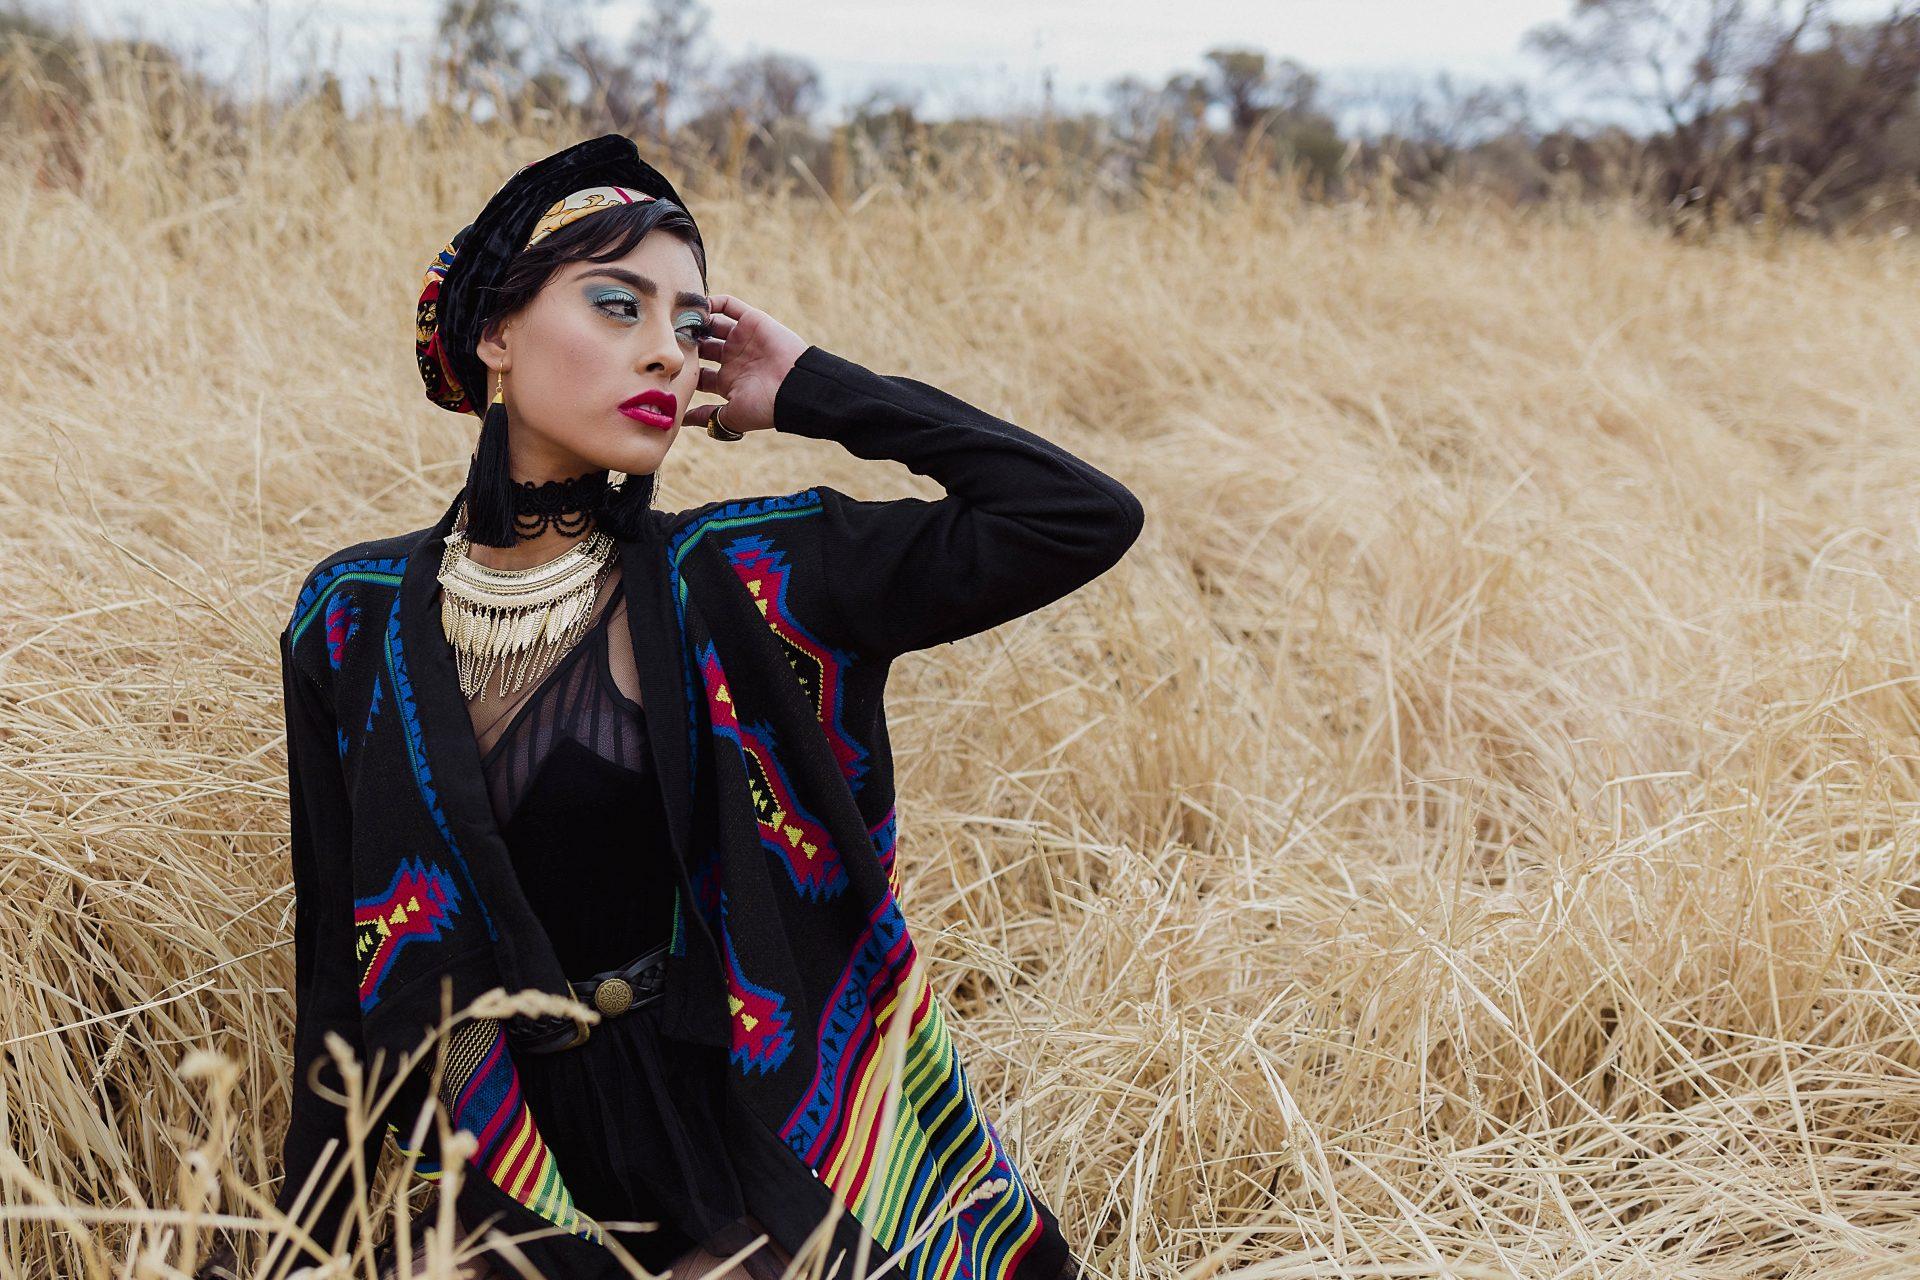 fotografo_profesional_bodas_casual_zacatecas_xv_mexico_chihuahua-10